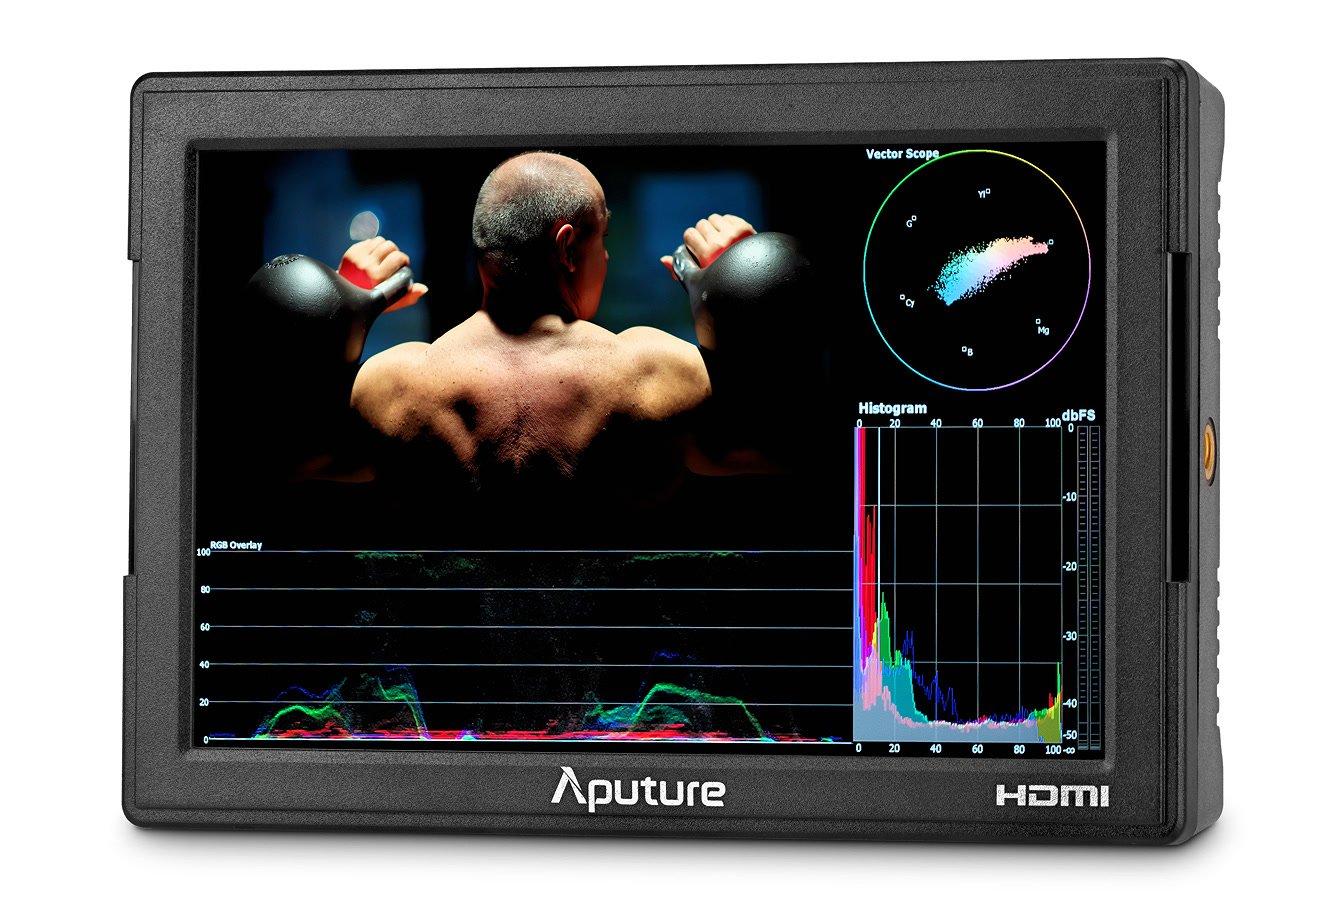 Aputure VS-5 PRO Full HD 17.8cm Monitor mit HDMI und HD-SDI.